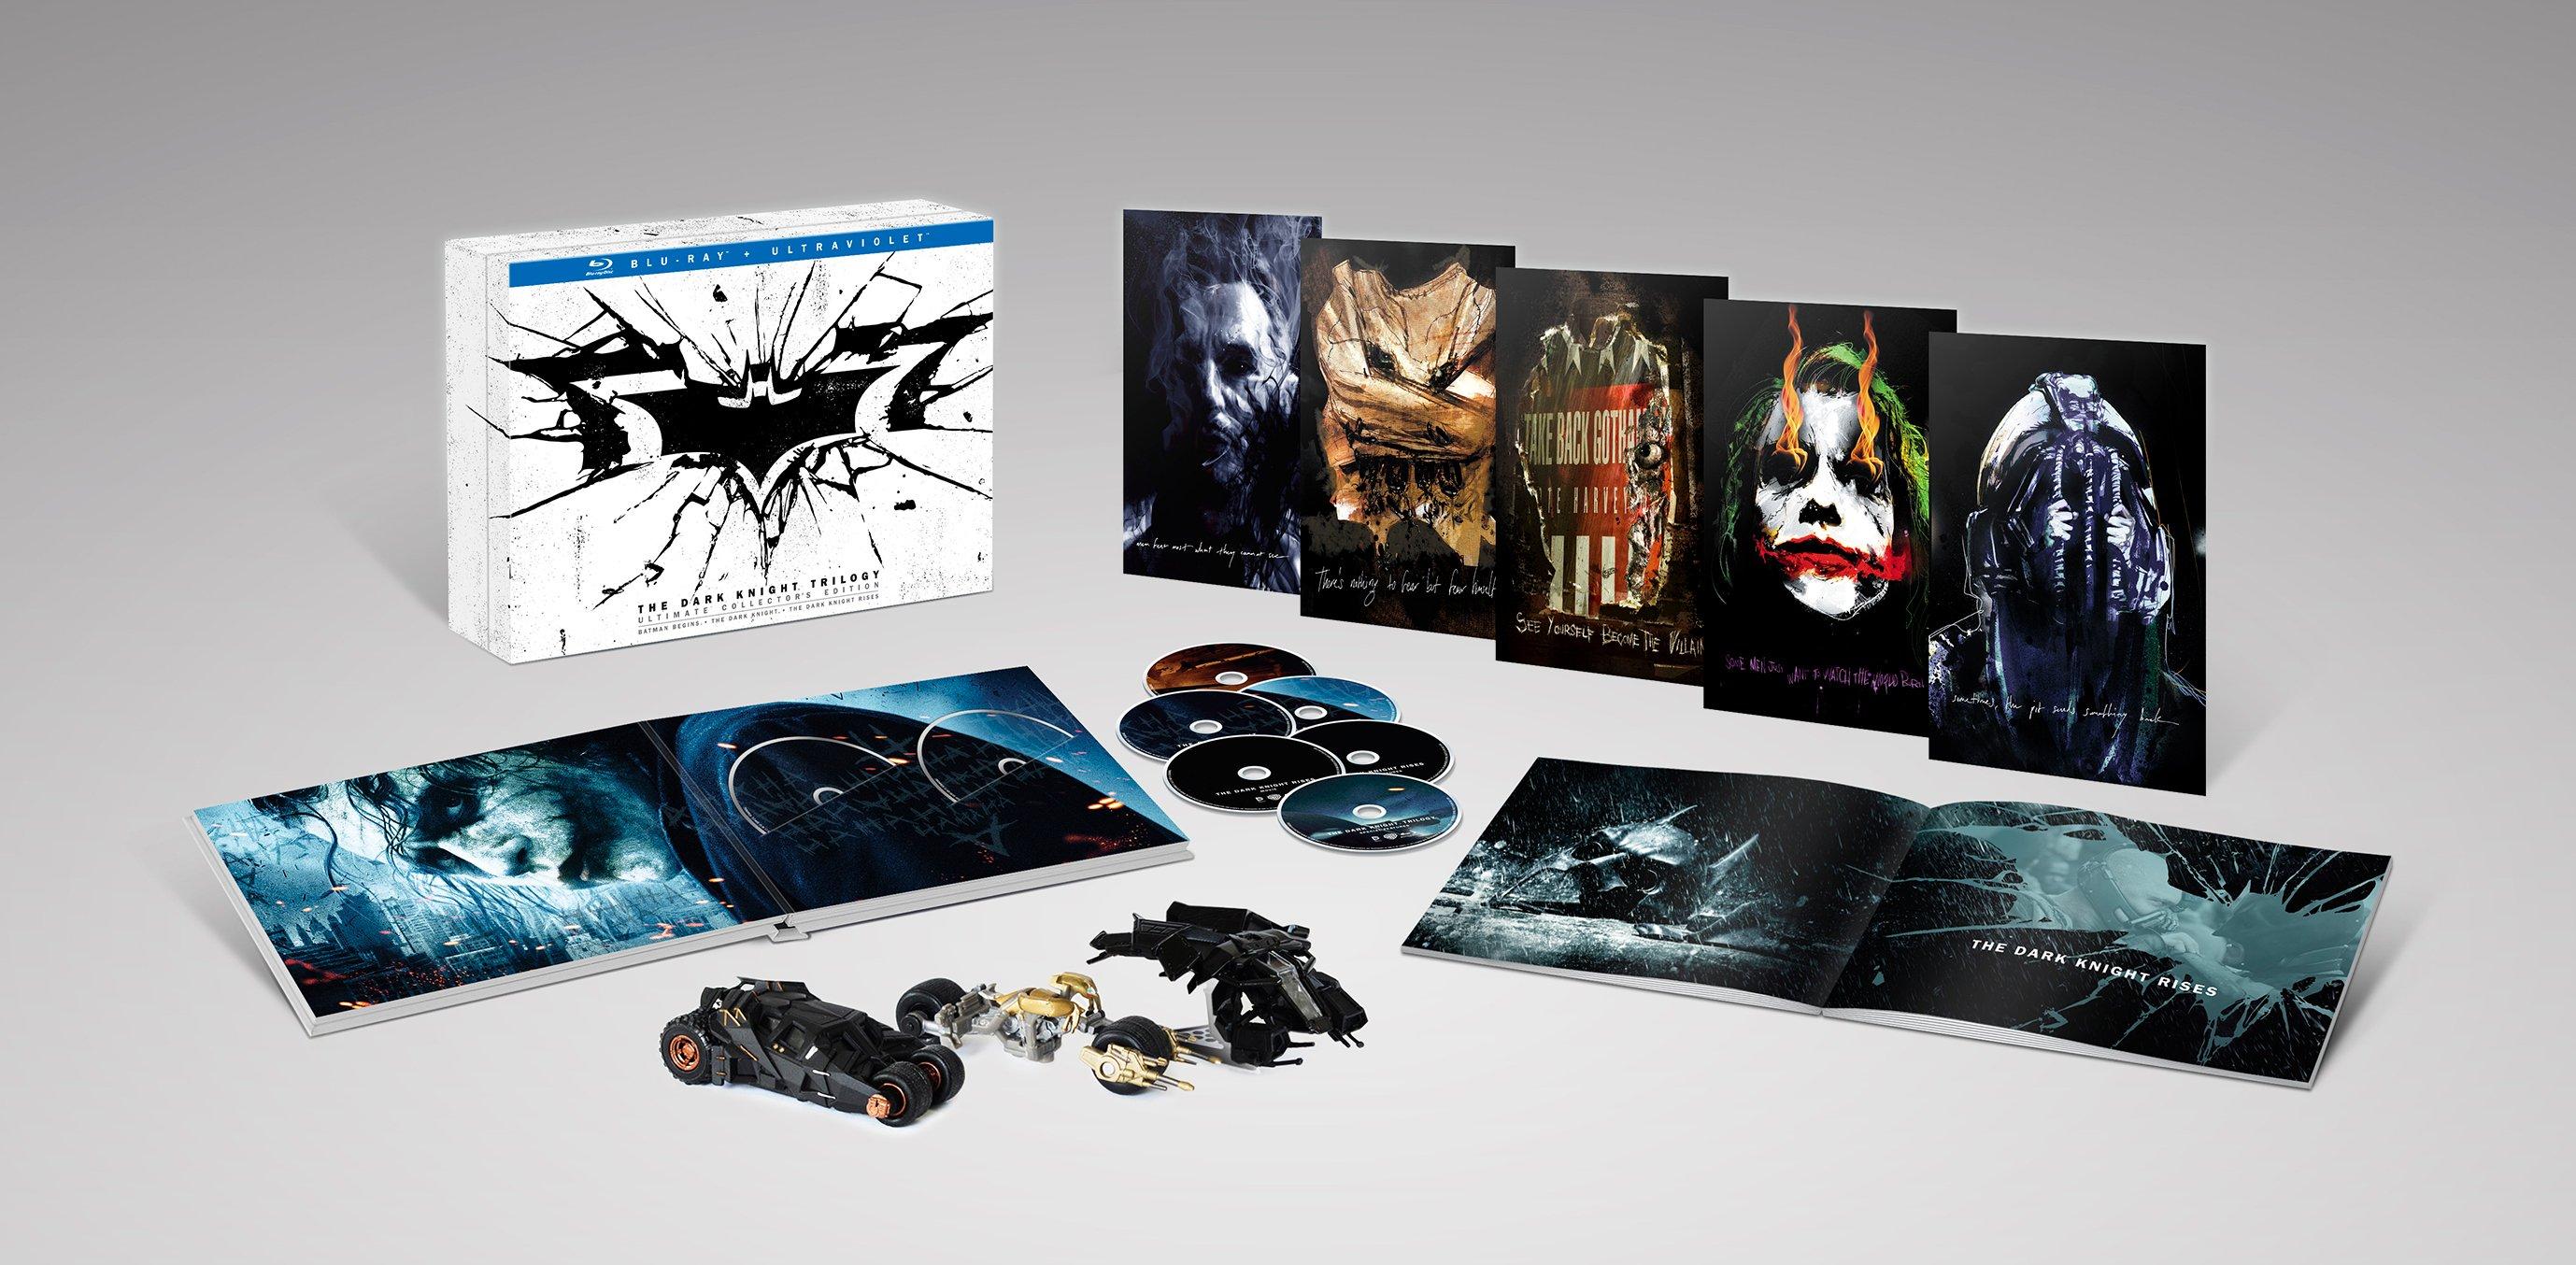 Хочу *_* The Dark Knight Trilogy: Ultimate Collector's Edition#batman. - Изображение 1